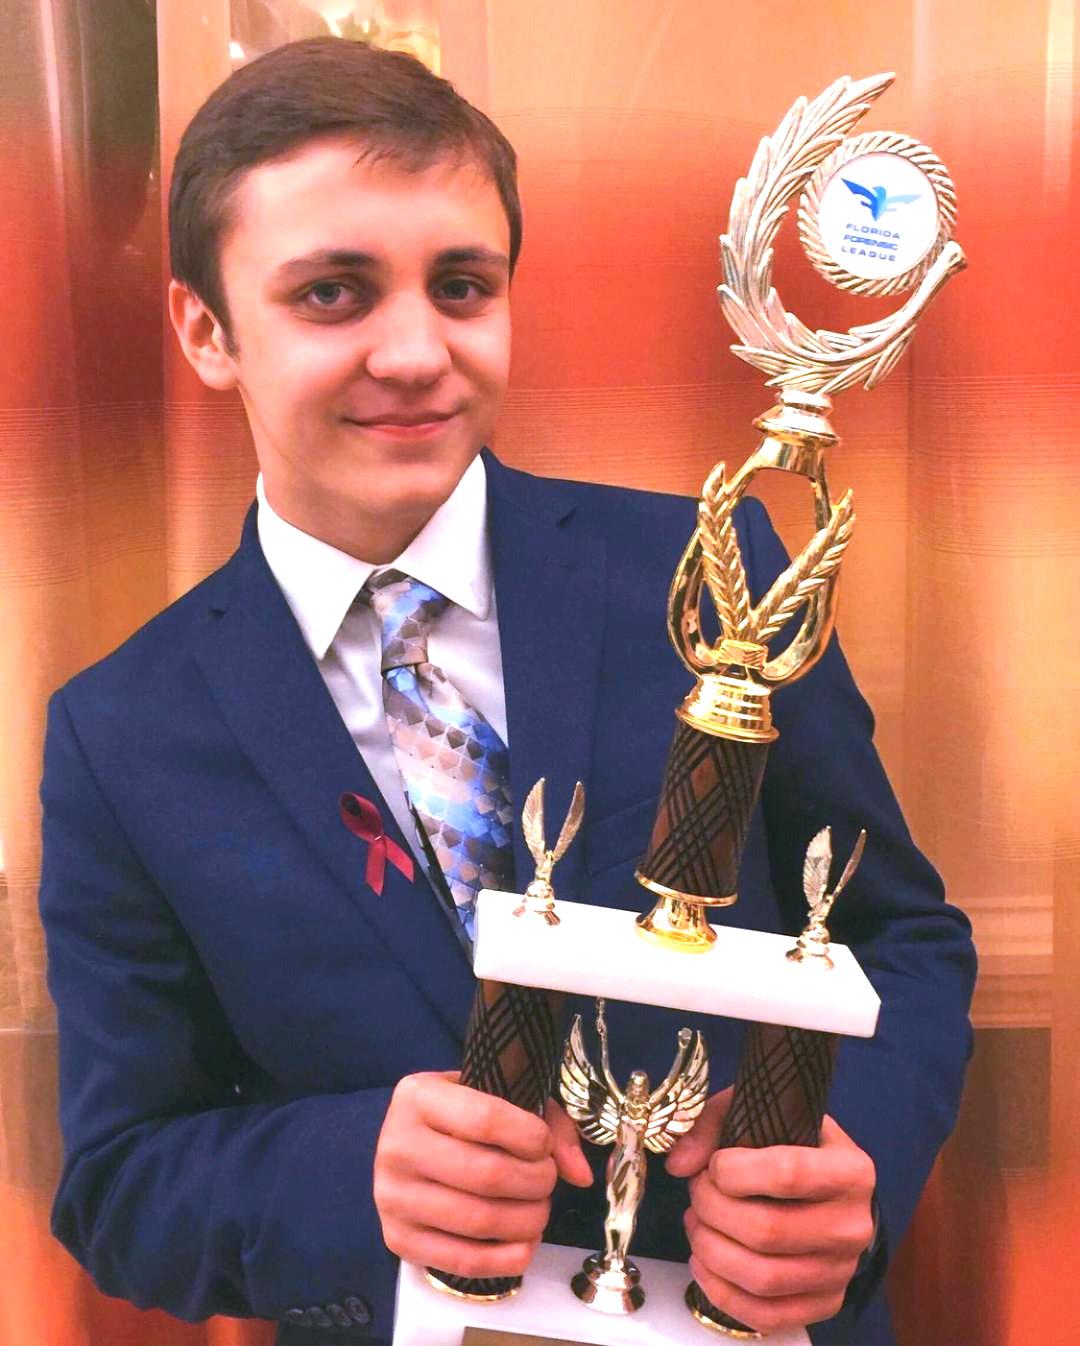 Matteo Mauro,GBHS, wins the 2020 North Florida Optimist Oratorical Contest & advances to nat